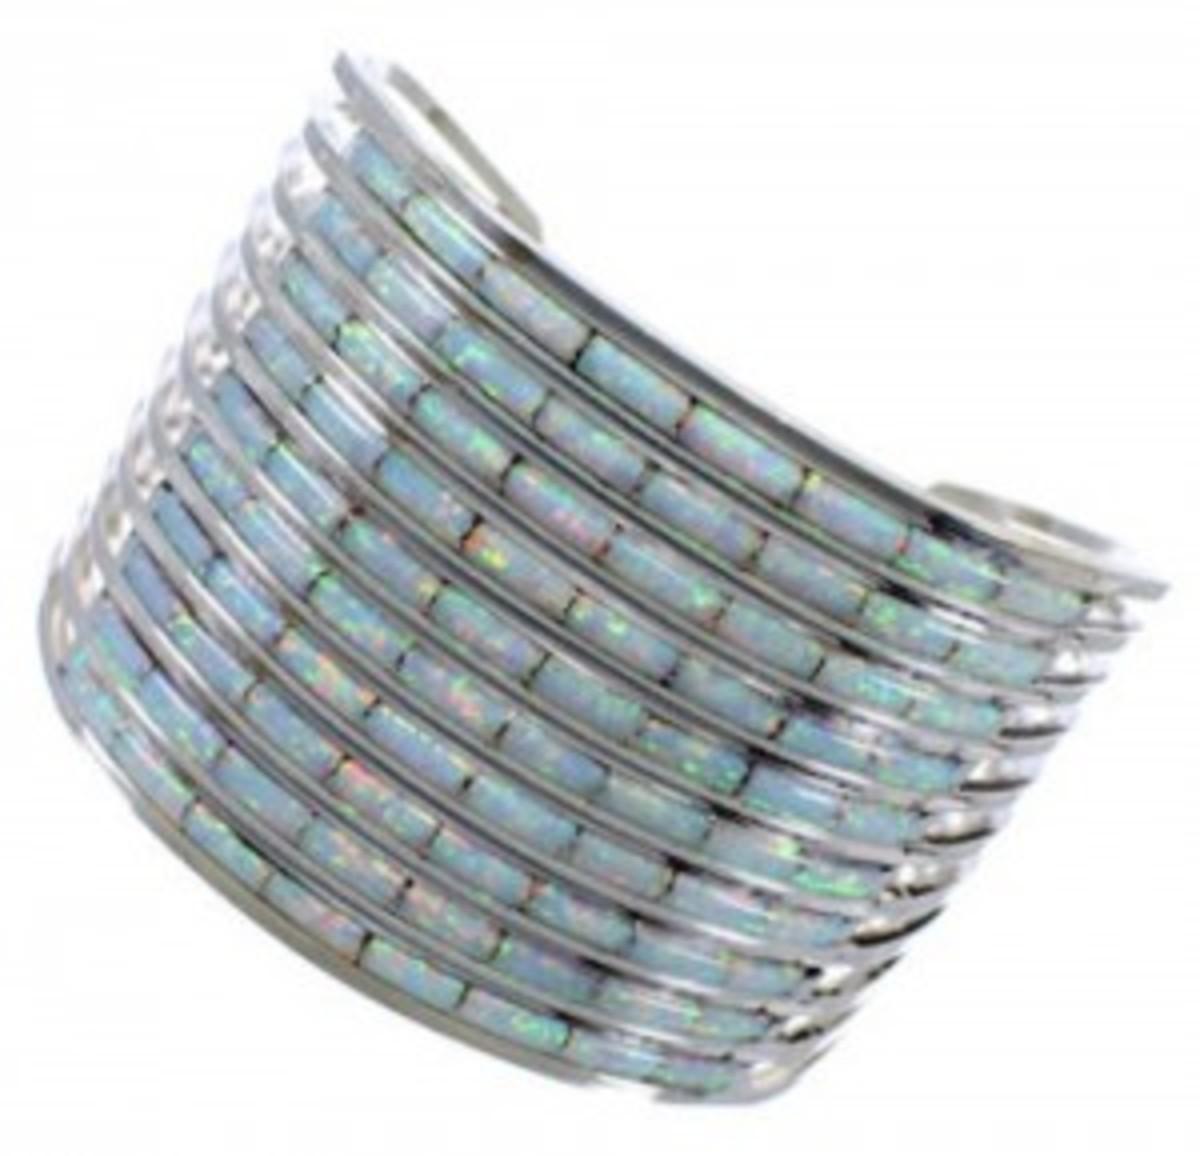 Zuni genuine sterling silver and opal inlay cuff bracelet.